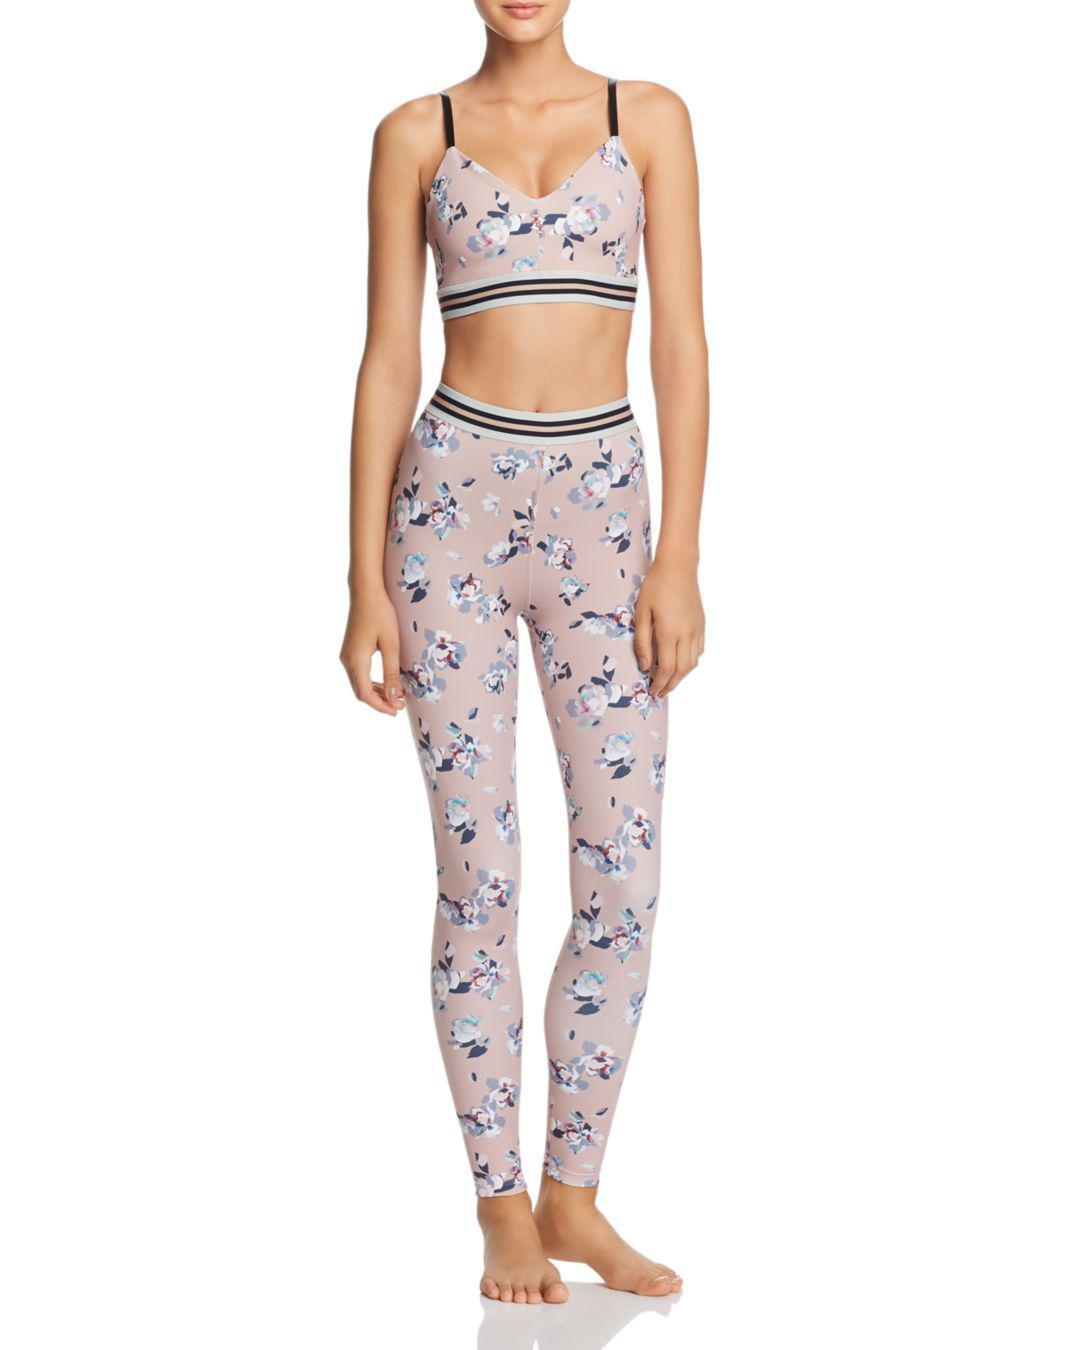 022819297b9325 Beyond Yoga Olympus Floral Print Leggings - Lyst